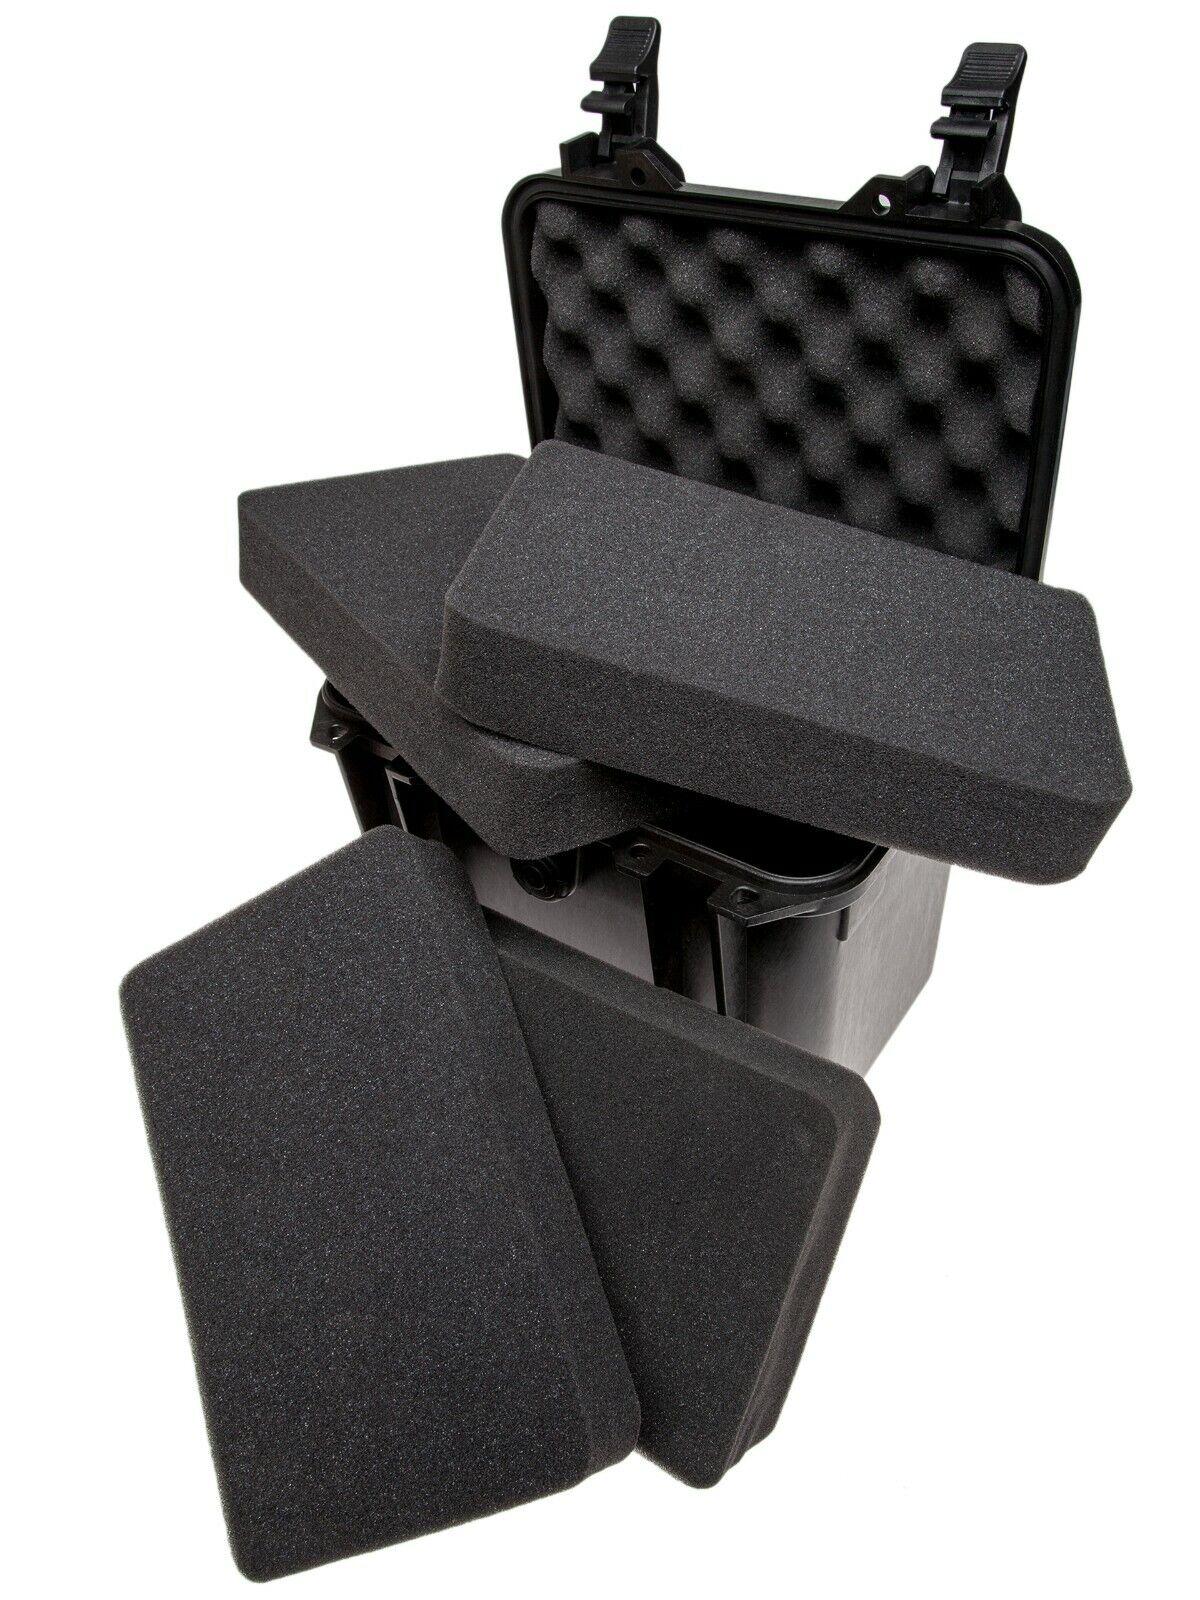 Small Camera Hard Case With Soft Foam (27.50 x 26.30 x 25cm) (No. 971)